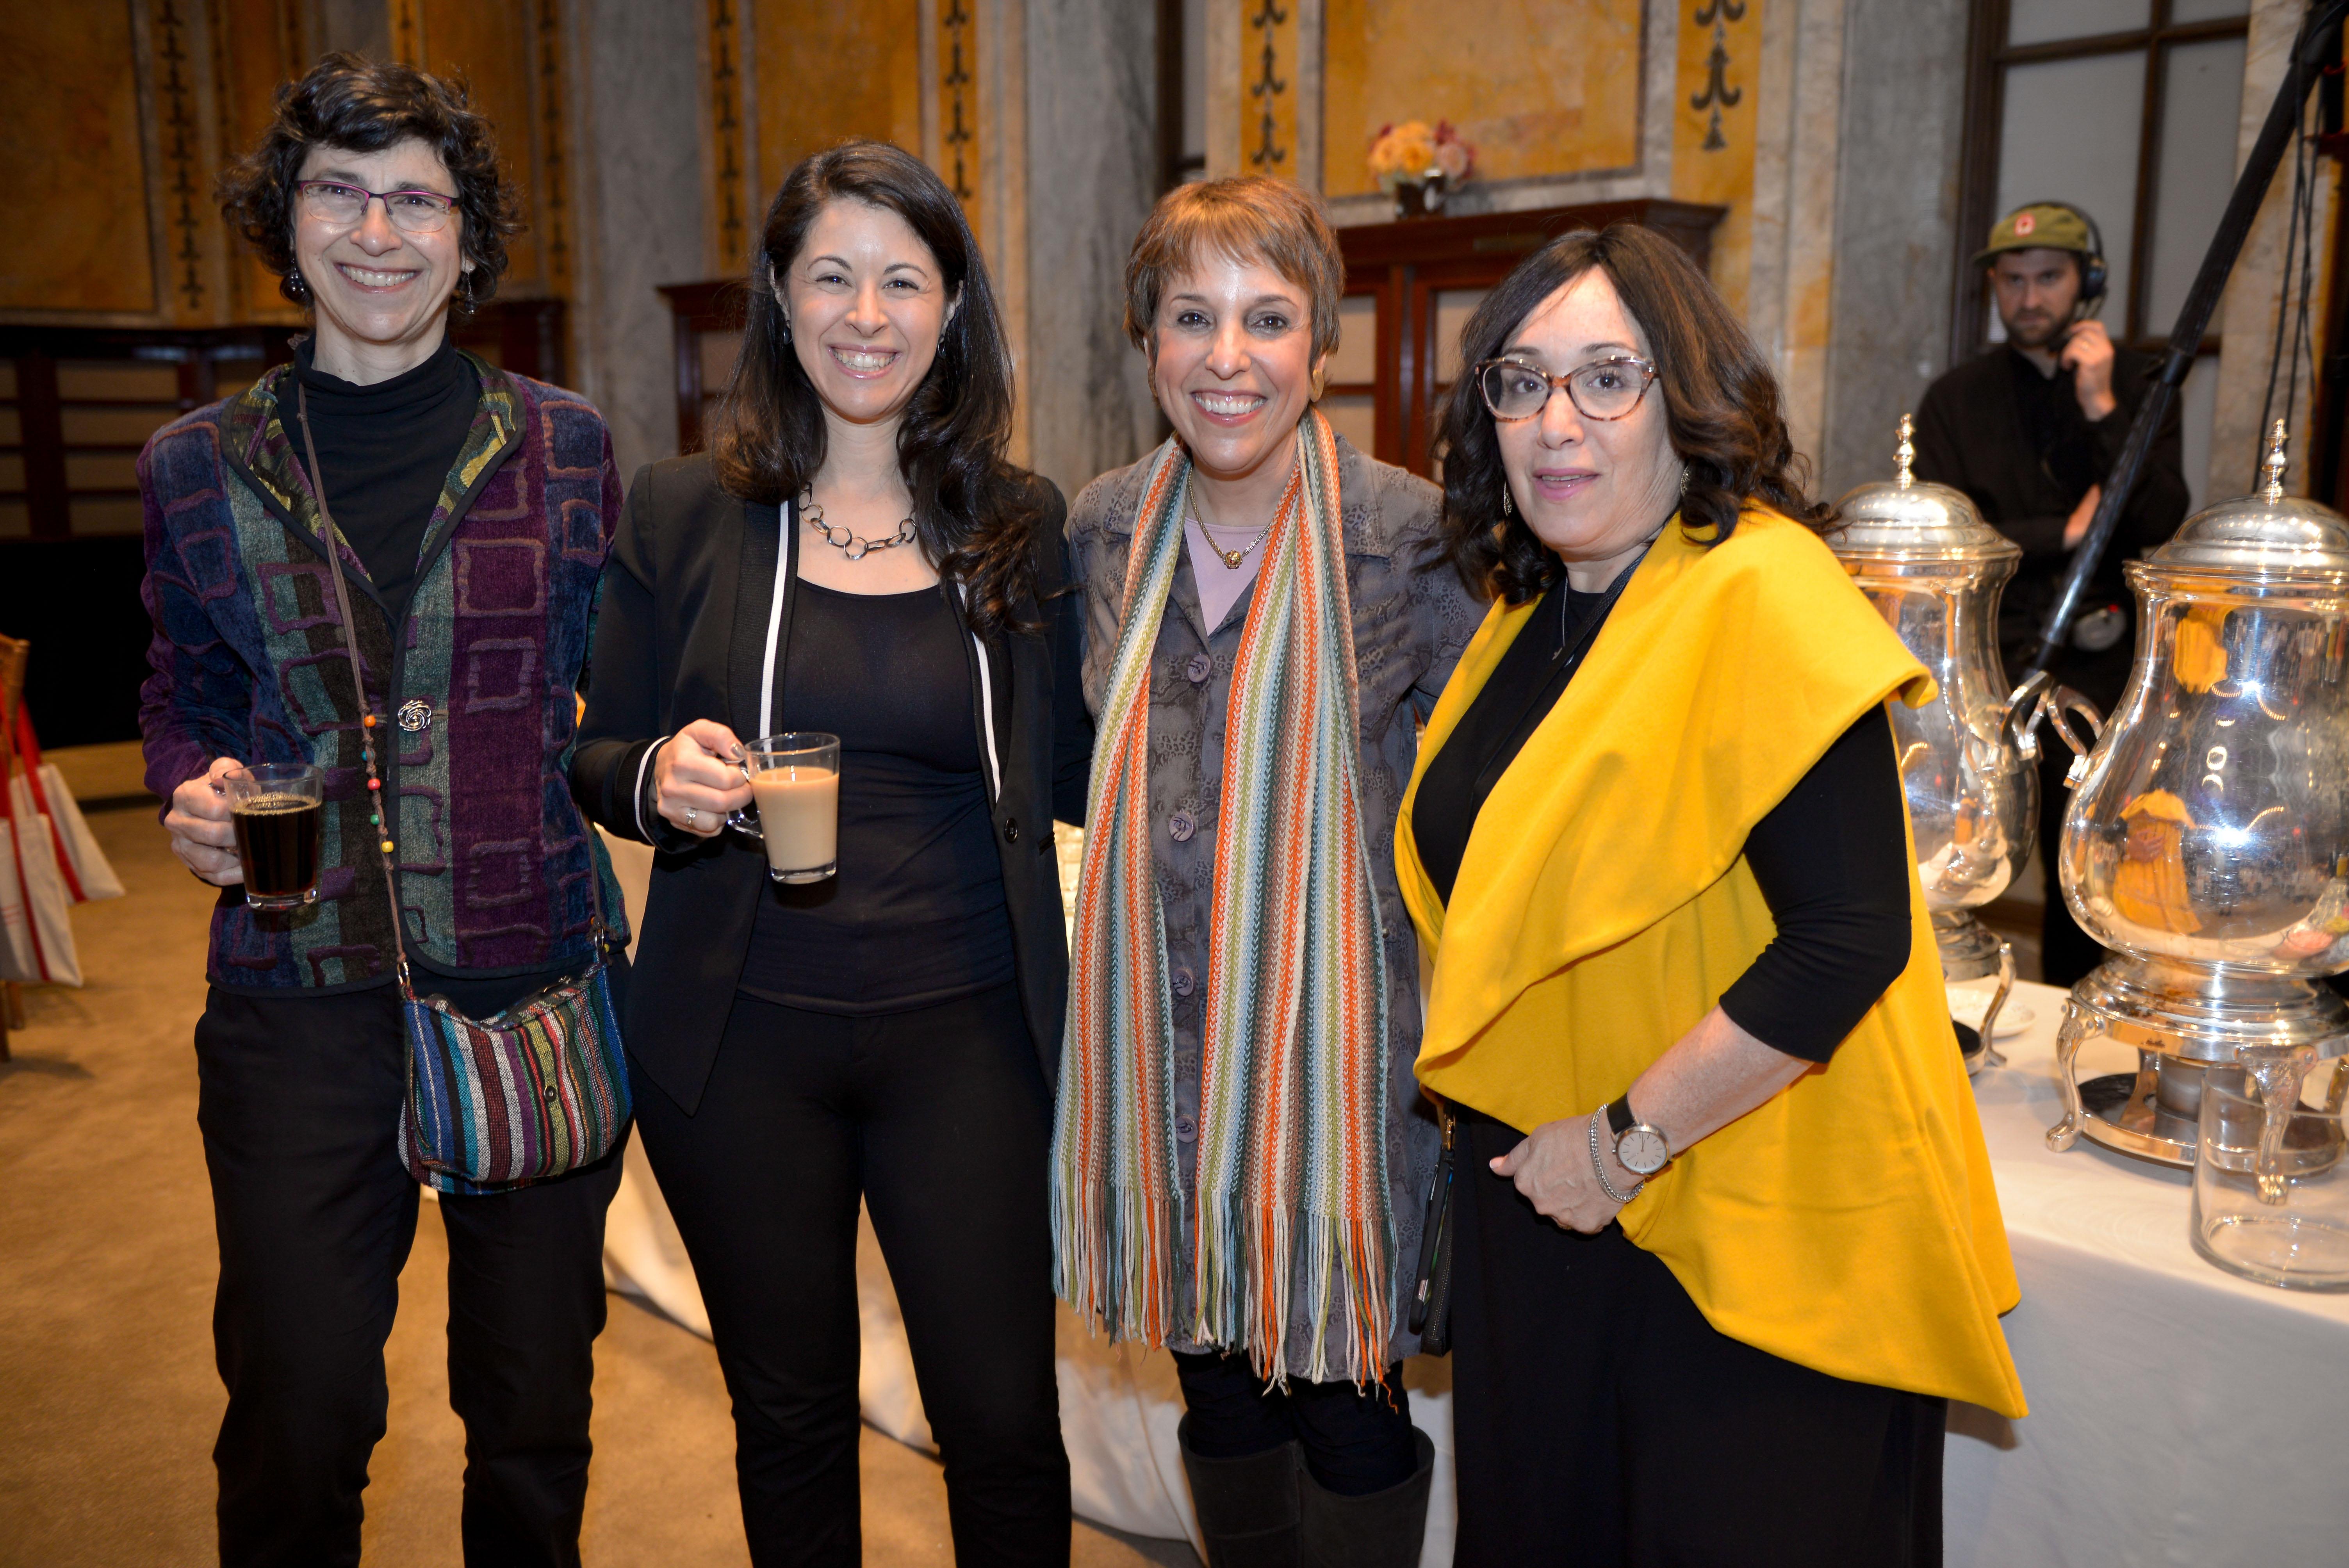 From Left: 2010 Covenant Award recipient Beth Huppin, 2011 Pomegranate Prize recipient and Covenant Board member Rabbi Shira Koch Epstein, 2011 Covenant Award recipient Amy Skopp Cooper, and 2012 Covenant Award recipient Gitta Jaroslawicz-Neufeld.